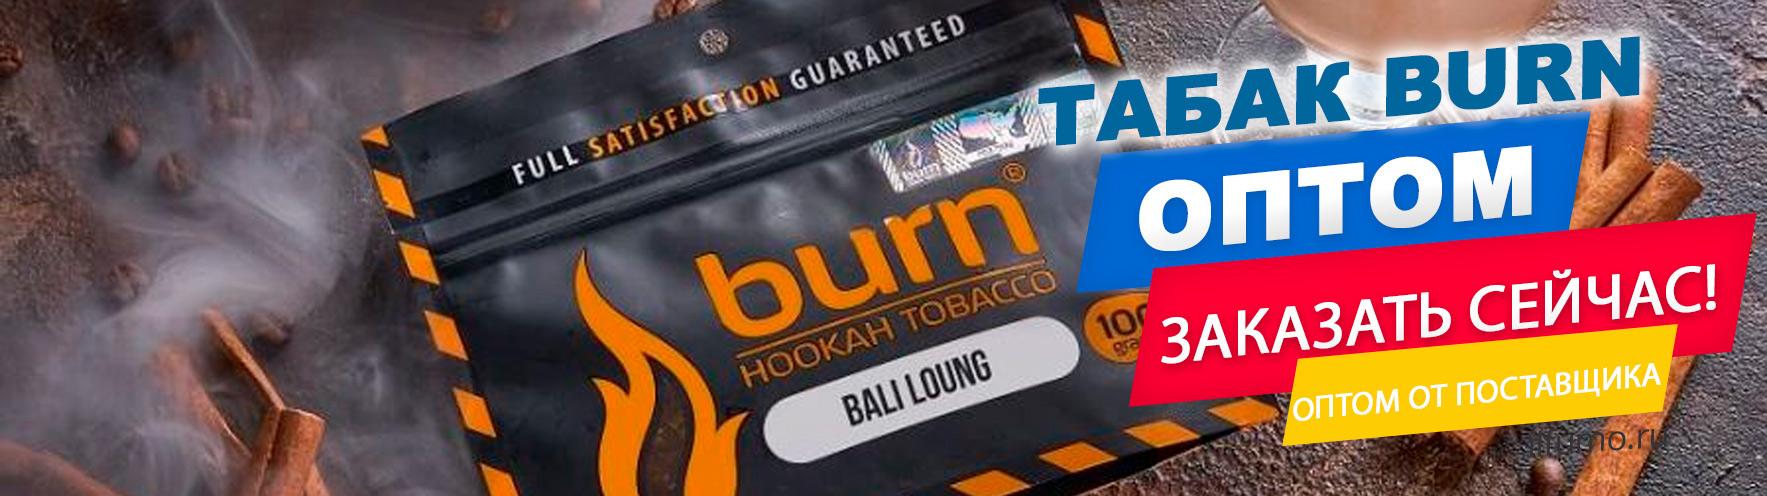 kupit tabak burn - Табак для кальяна BURN